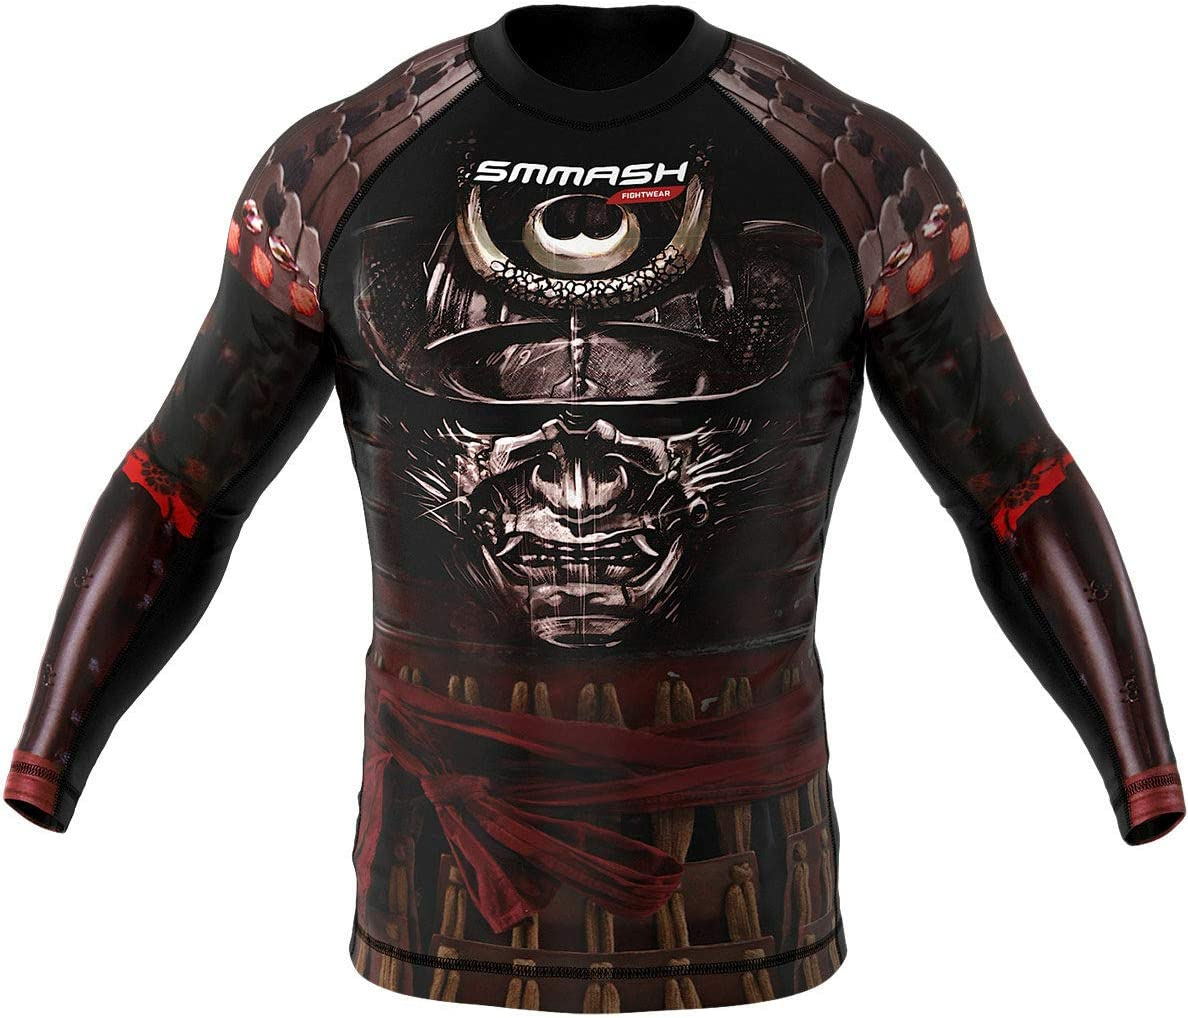 Rashguard SMMASH Samurai Manga Larga MMA BJJ UFC S M L XL XXL XXXL L